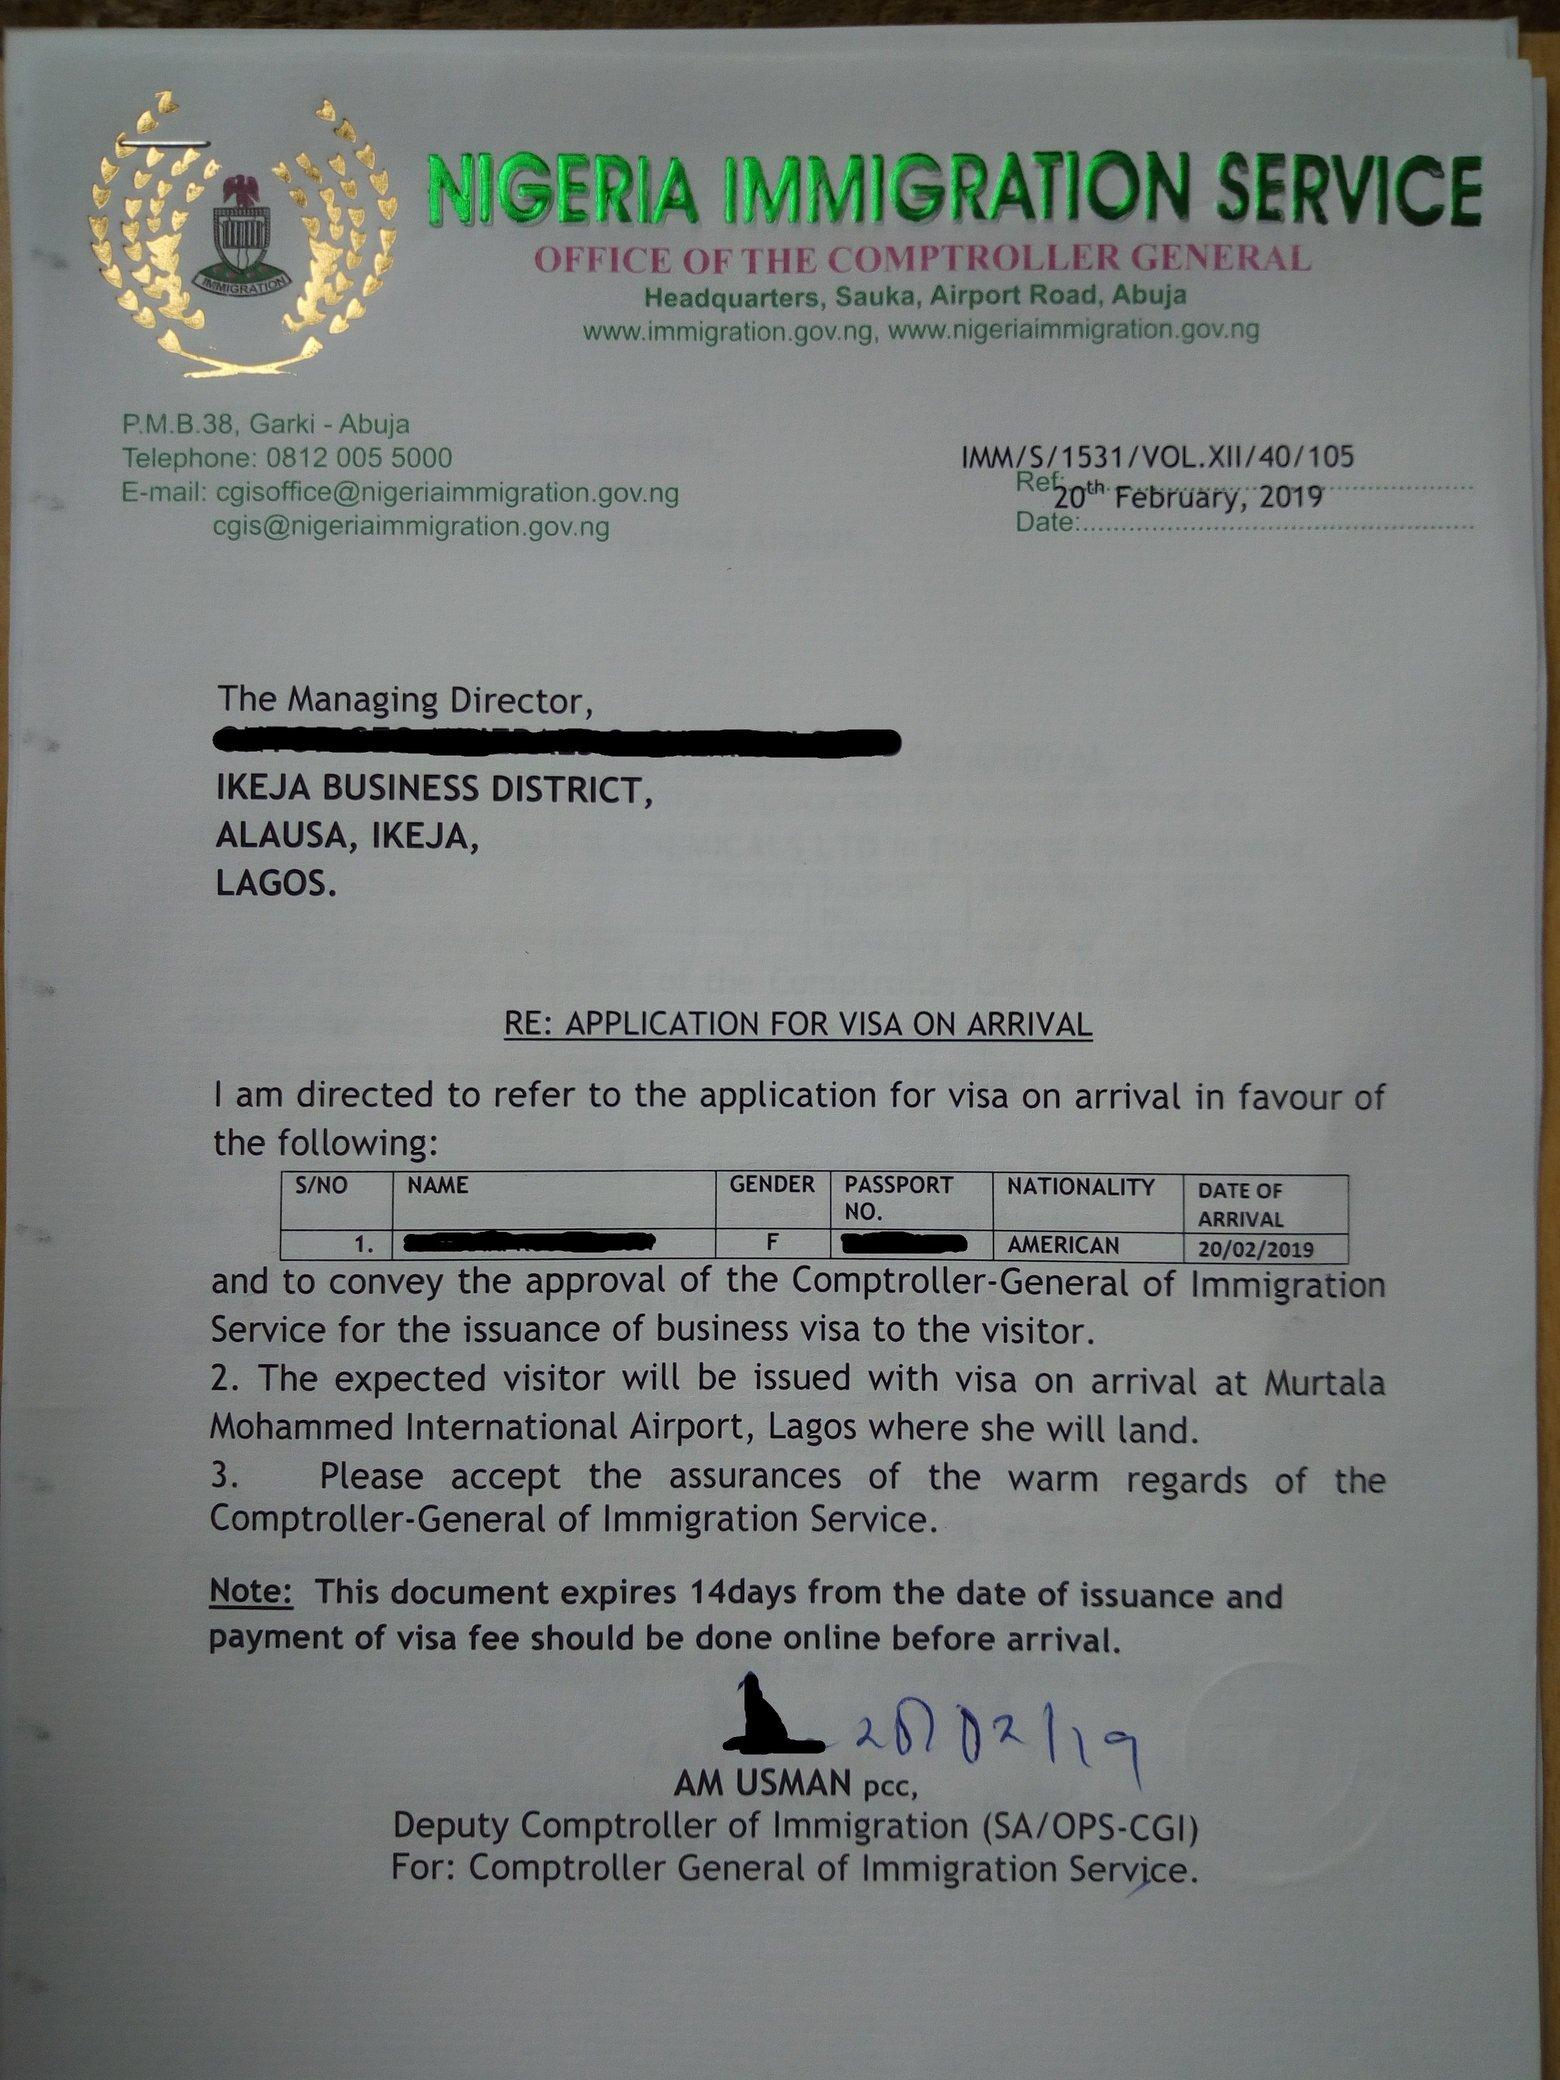 citizen application error saying cannot identify visa